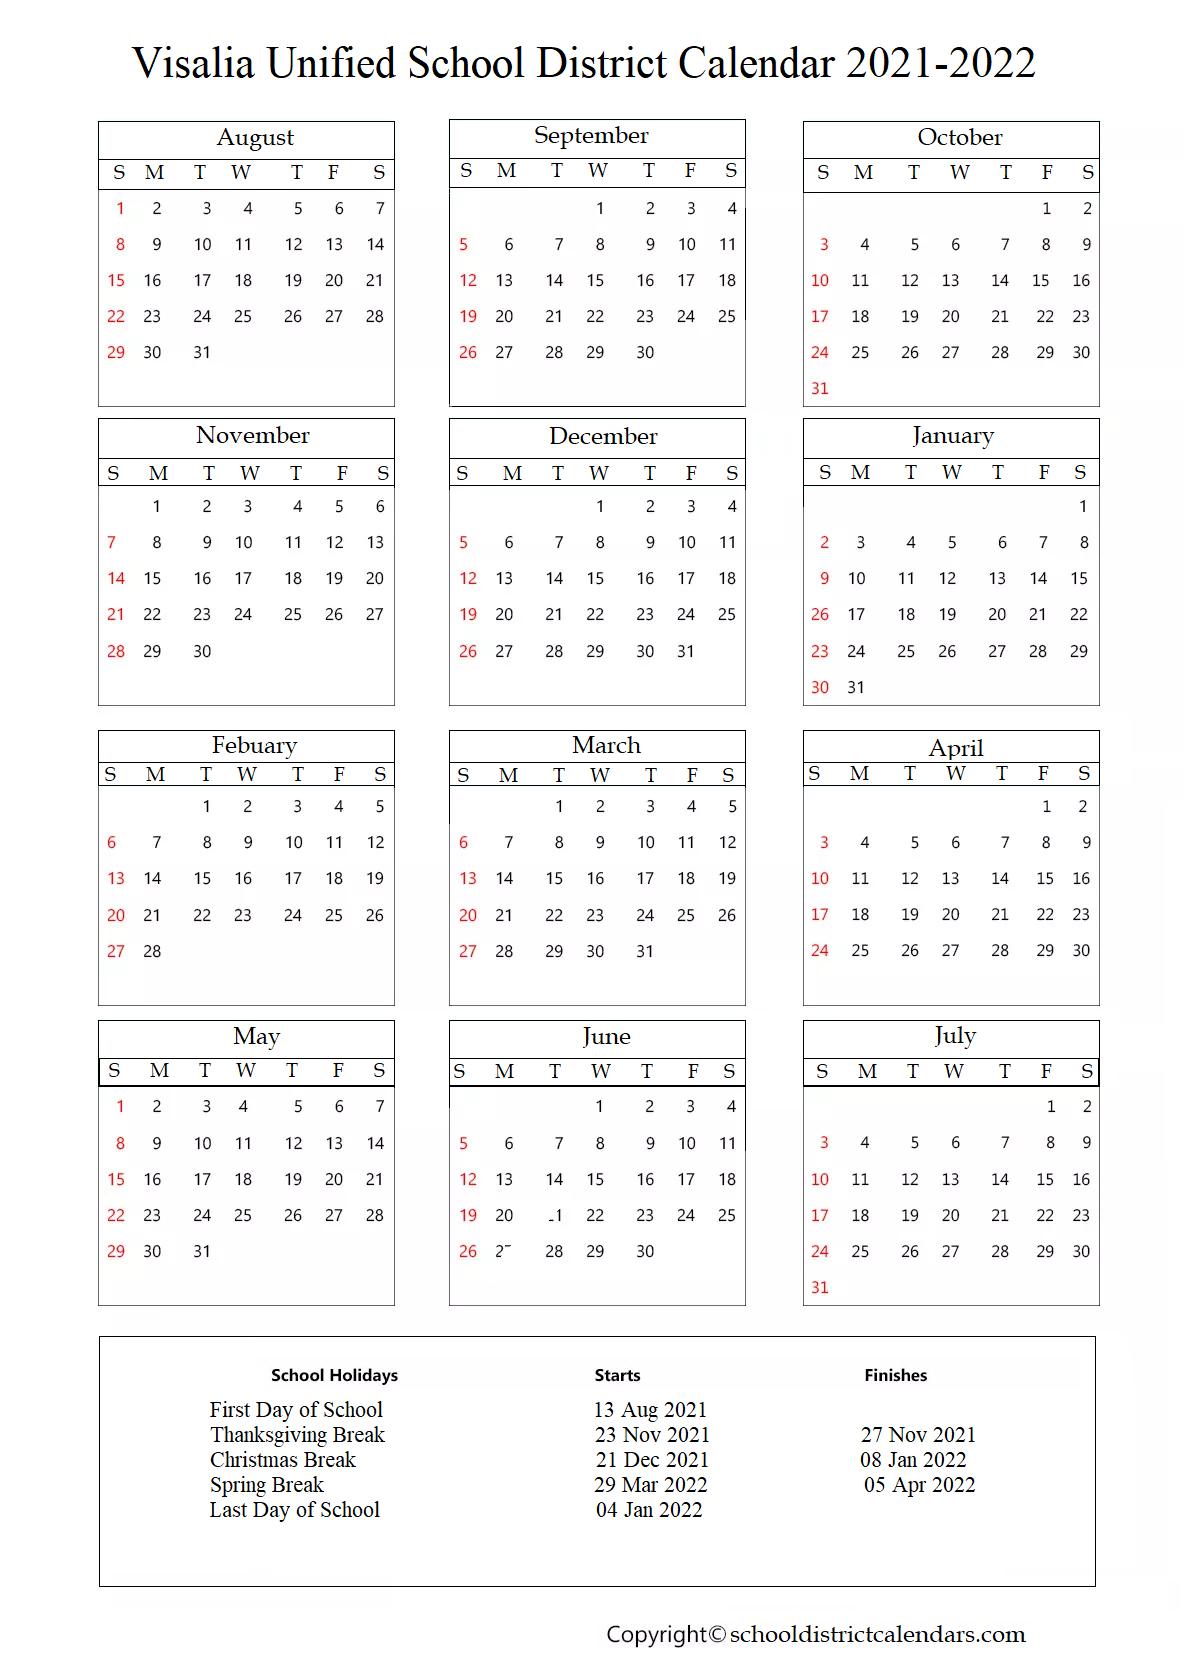 Visalia Unified School District Calendar Holidays 2021, California Calendar Holidays 2021